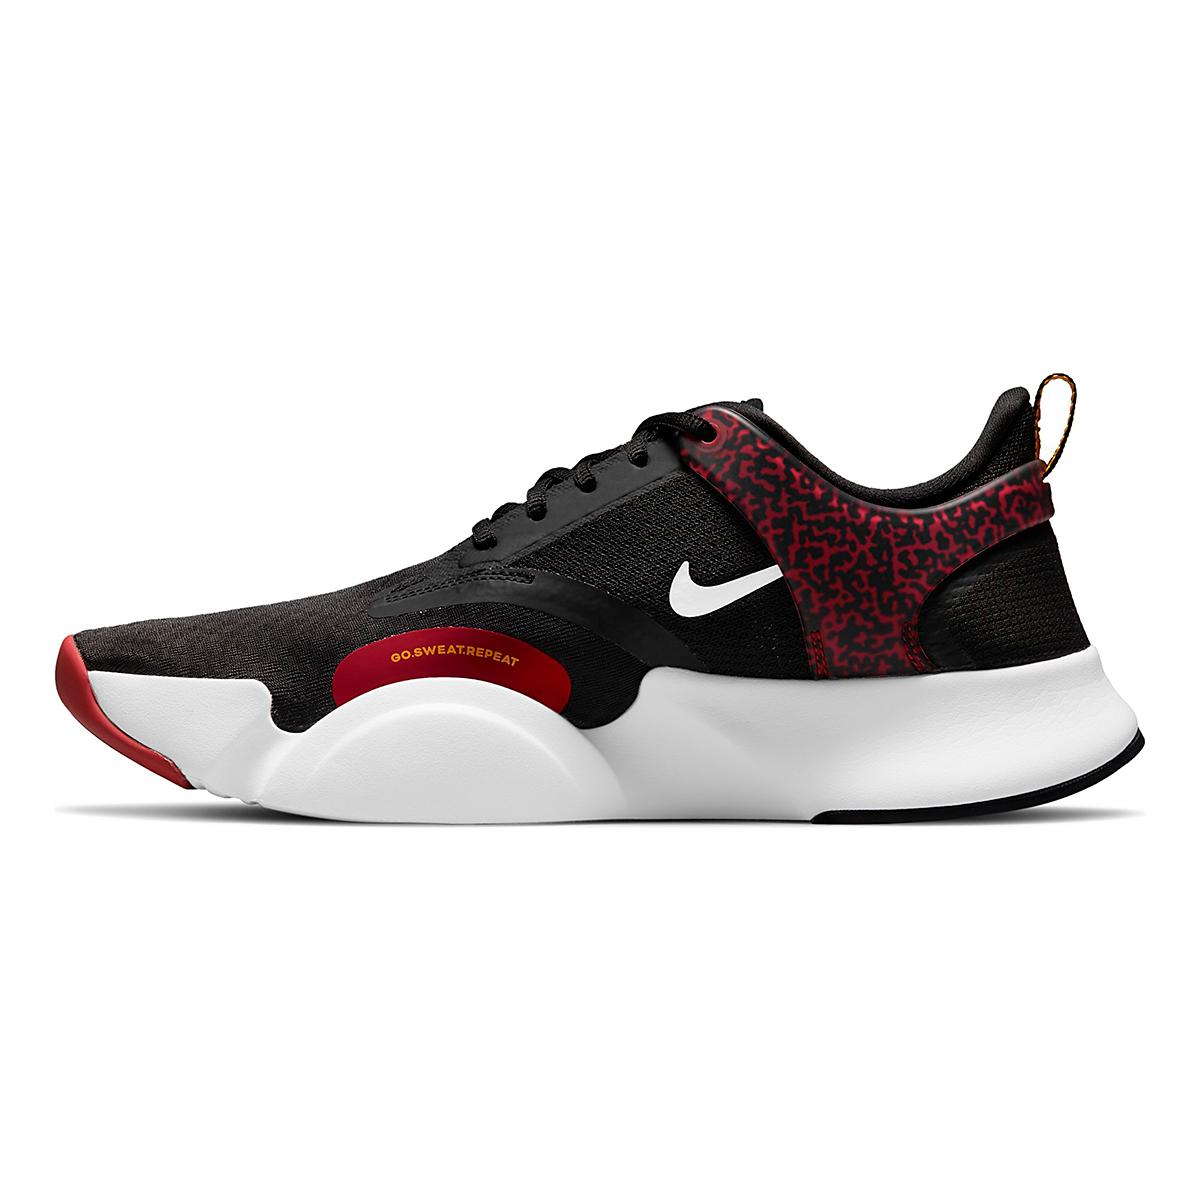 Men's Nike SuperRep Go 2 Training Shoe - Color: Black/White/Dark Cayenne/Solar Flare - Size: 6 - Width: Regular, Black/White/Dark Cayenne/Solar Flare, large, image 2